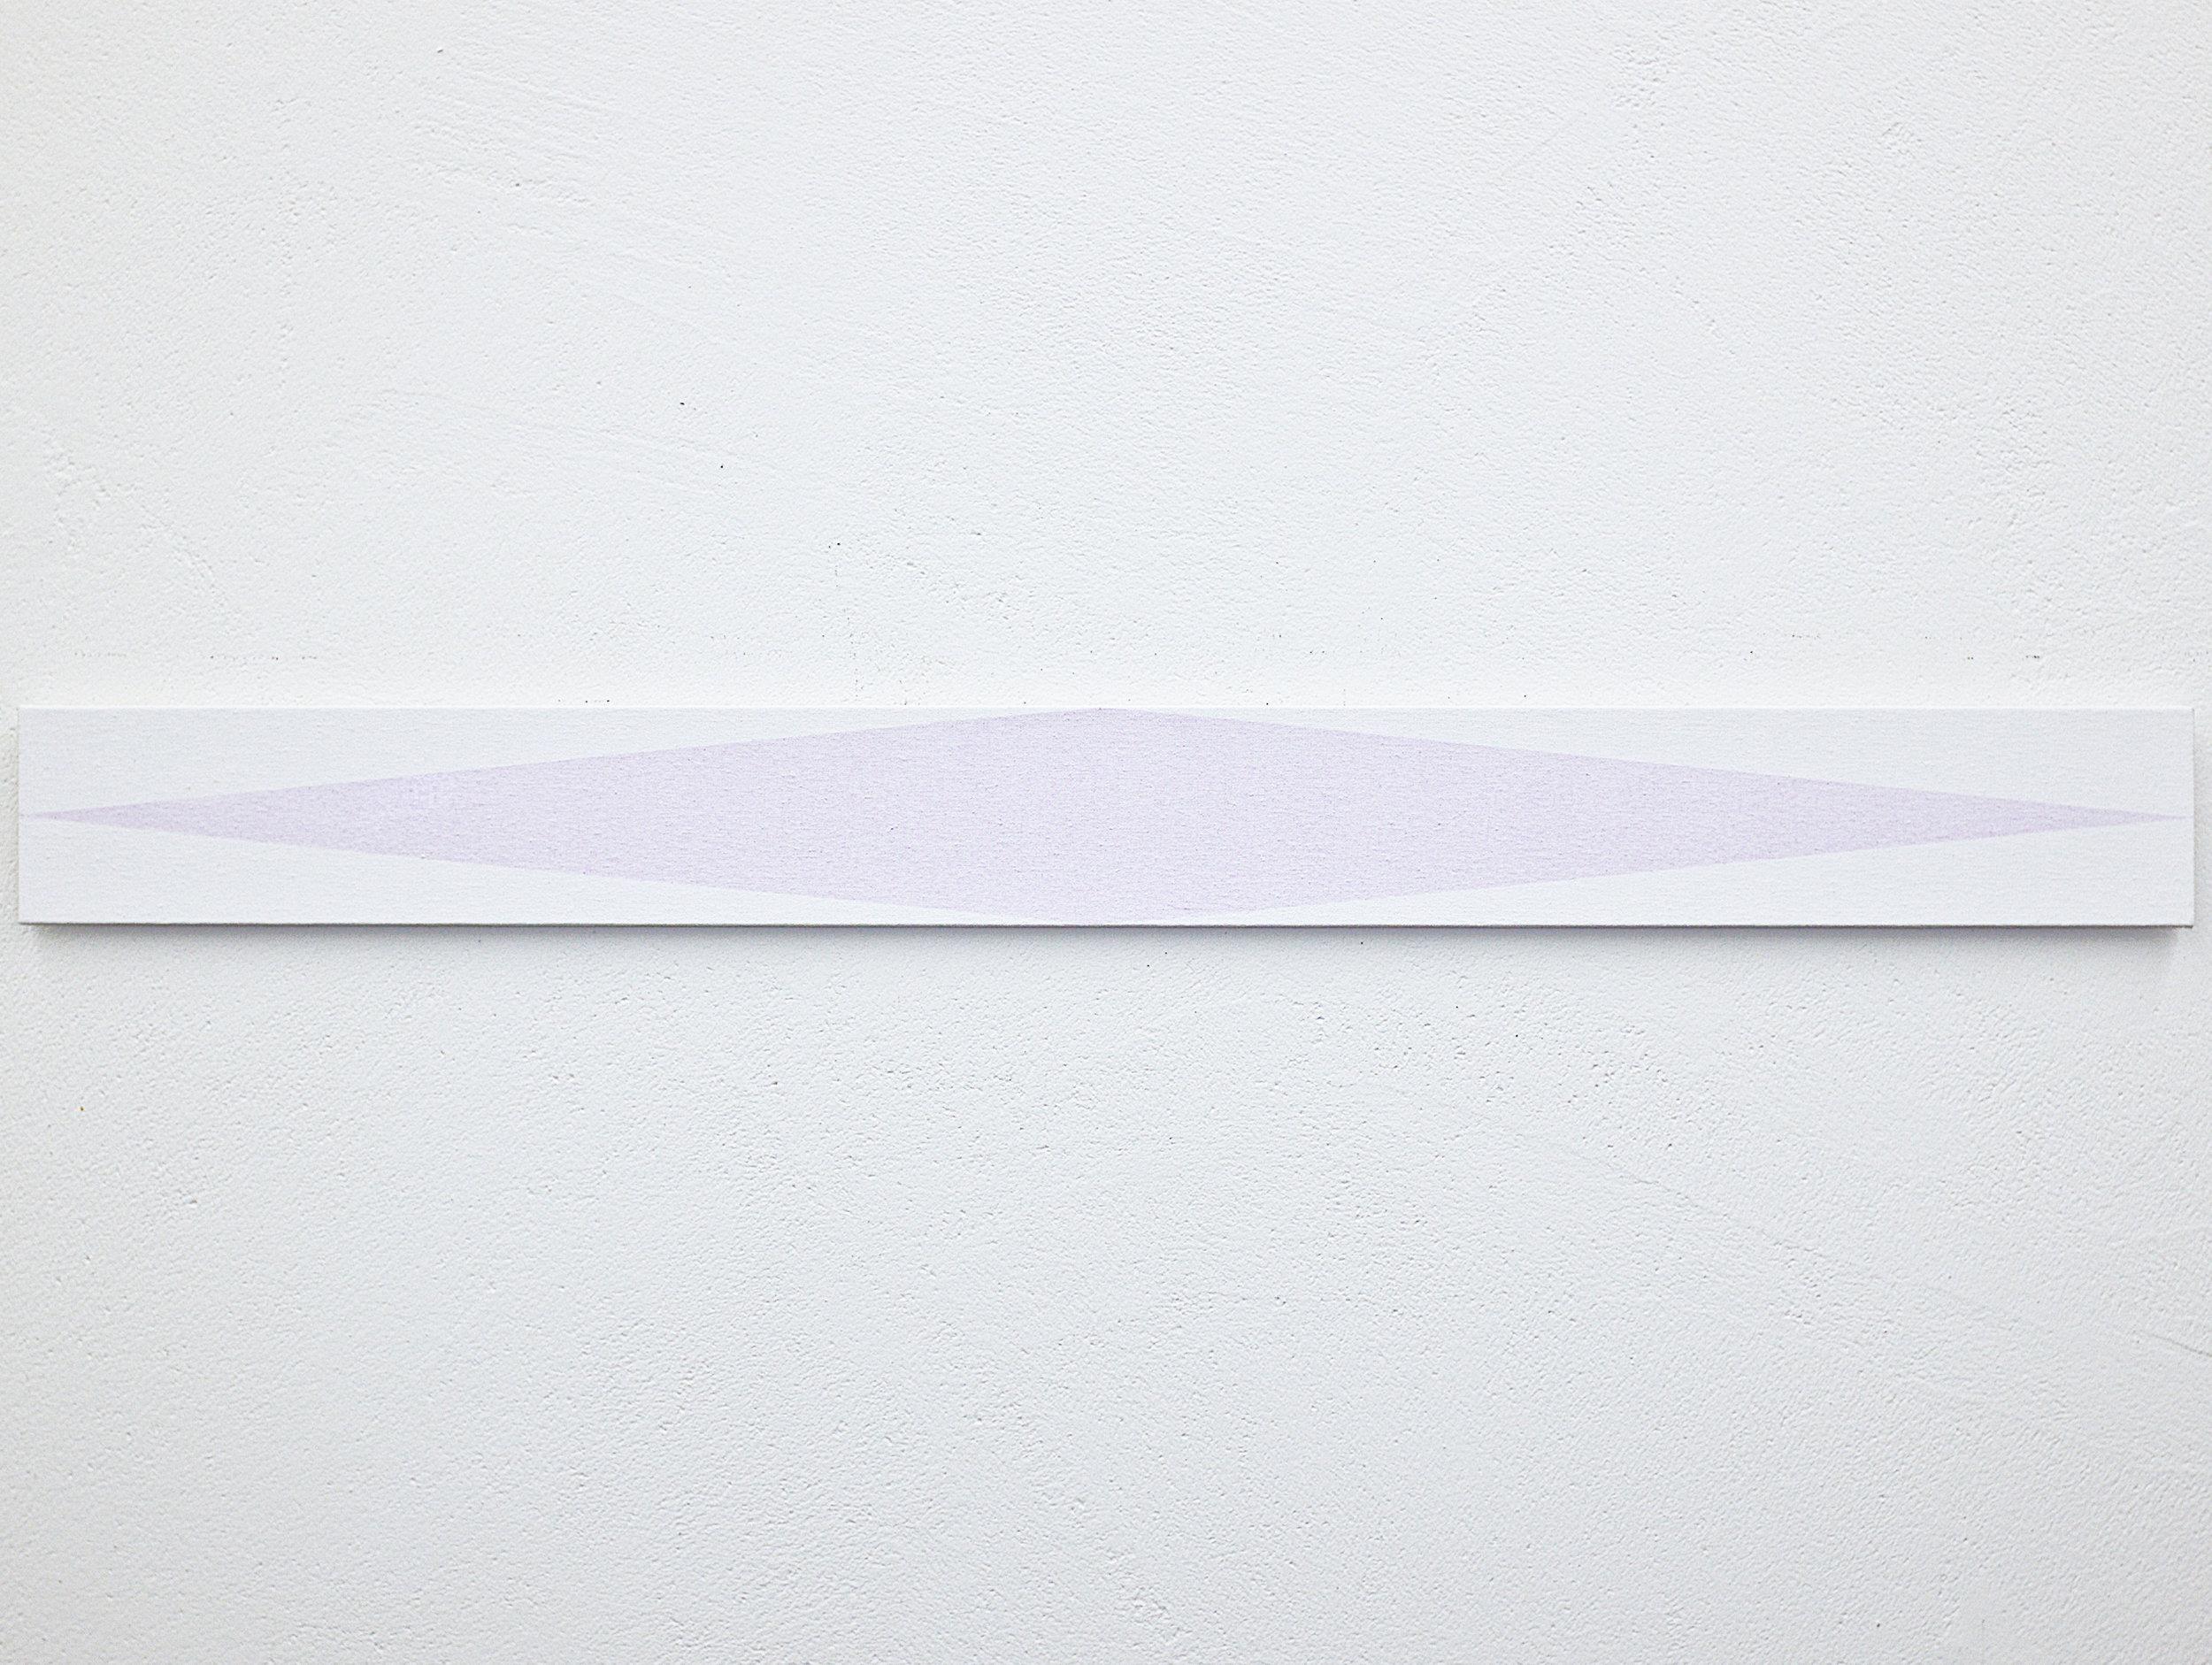 bild nr. 01.6/2017 - 10 x 100cm - acryl auf baumwolle/alu